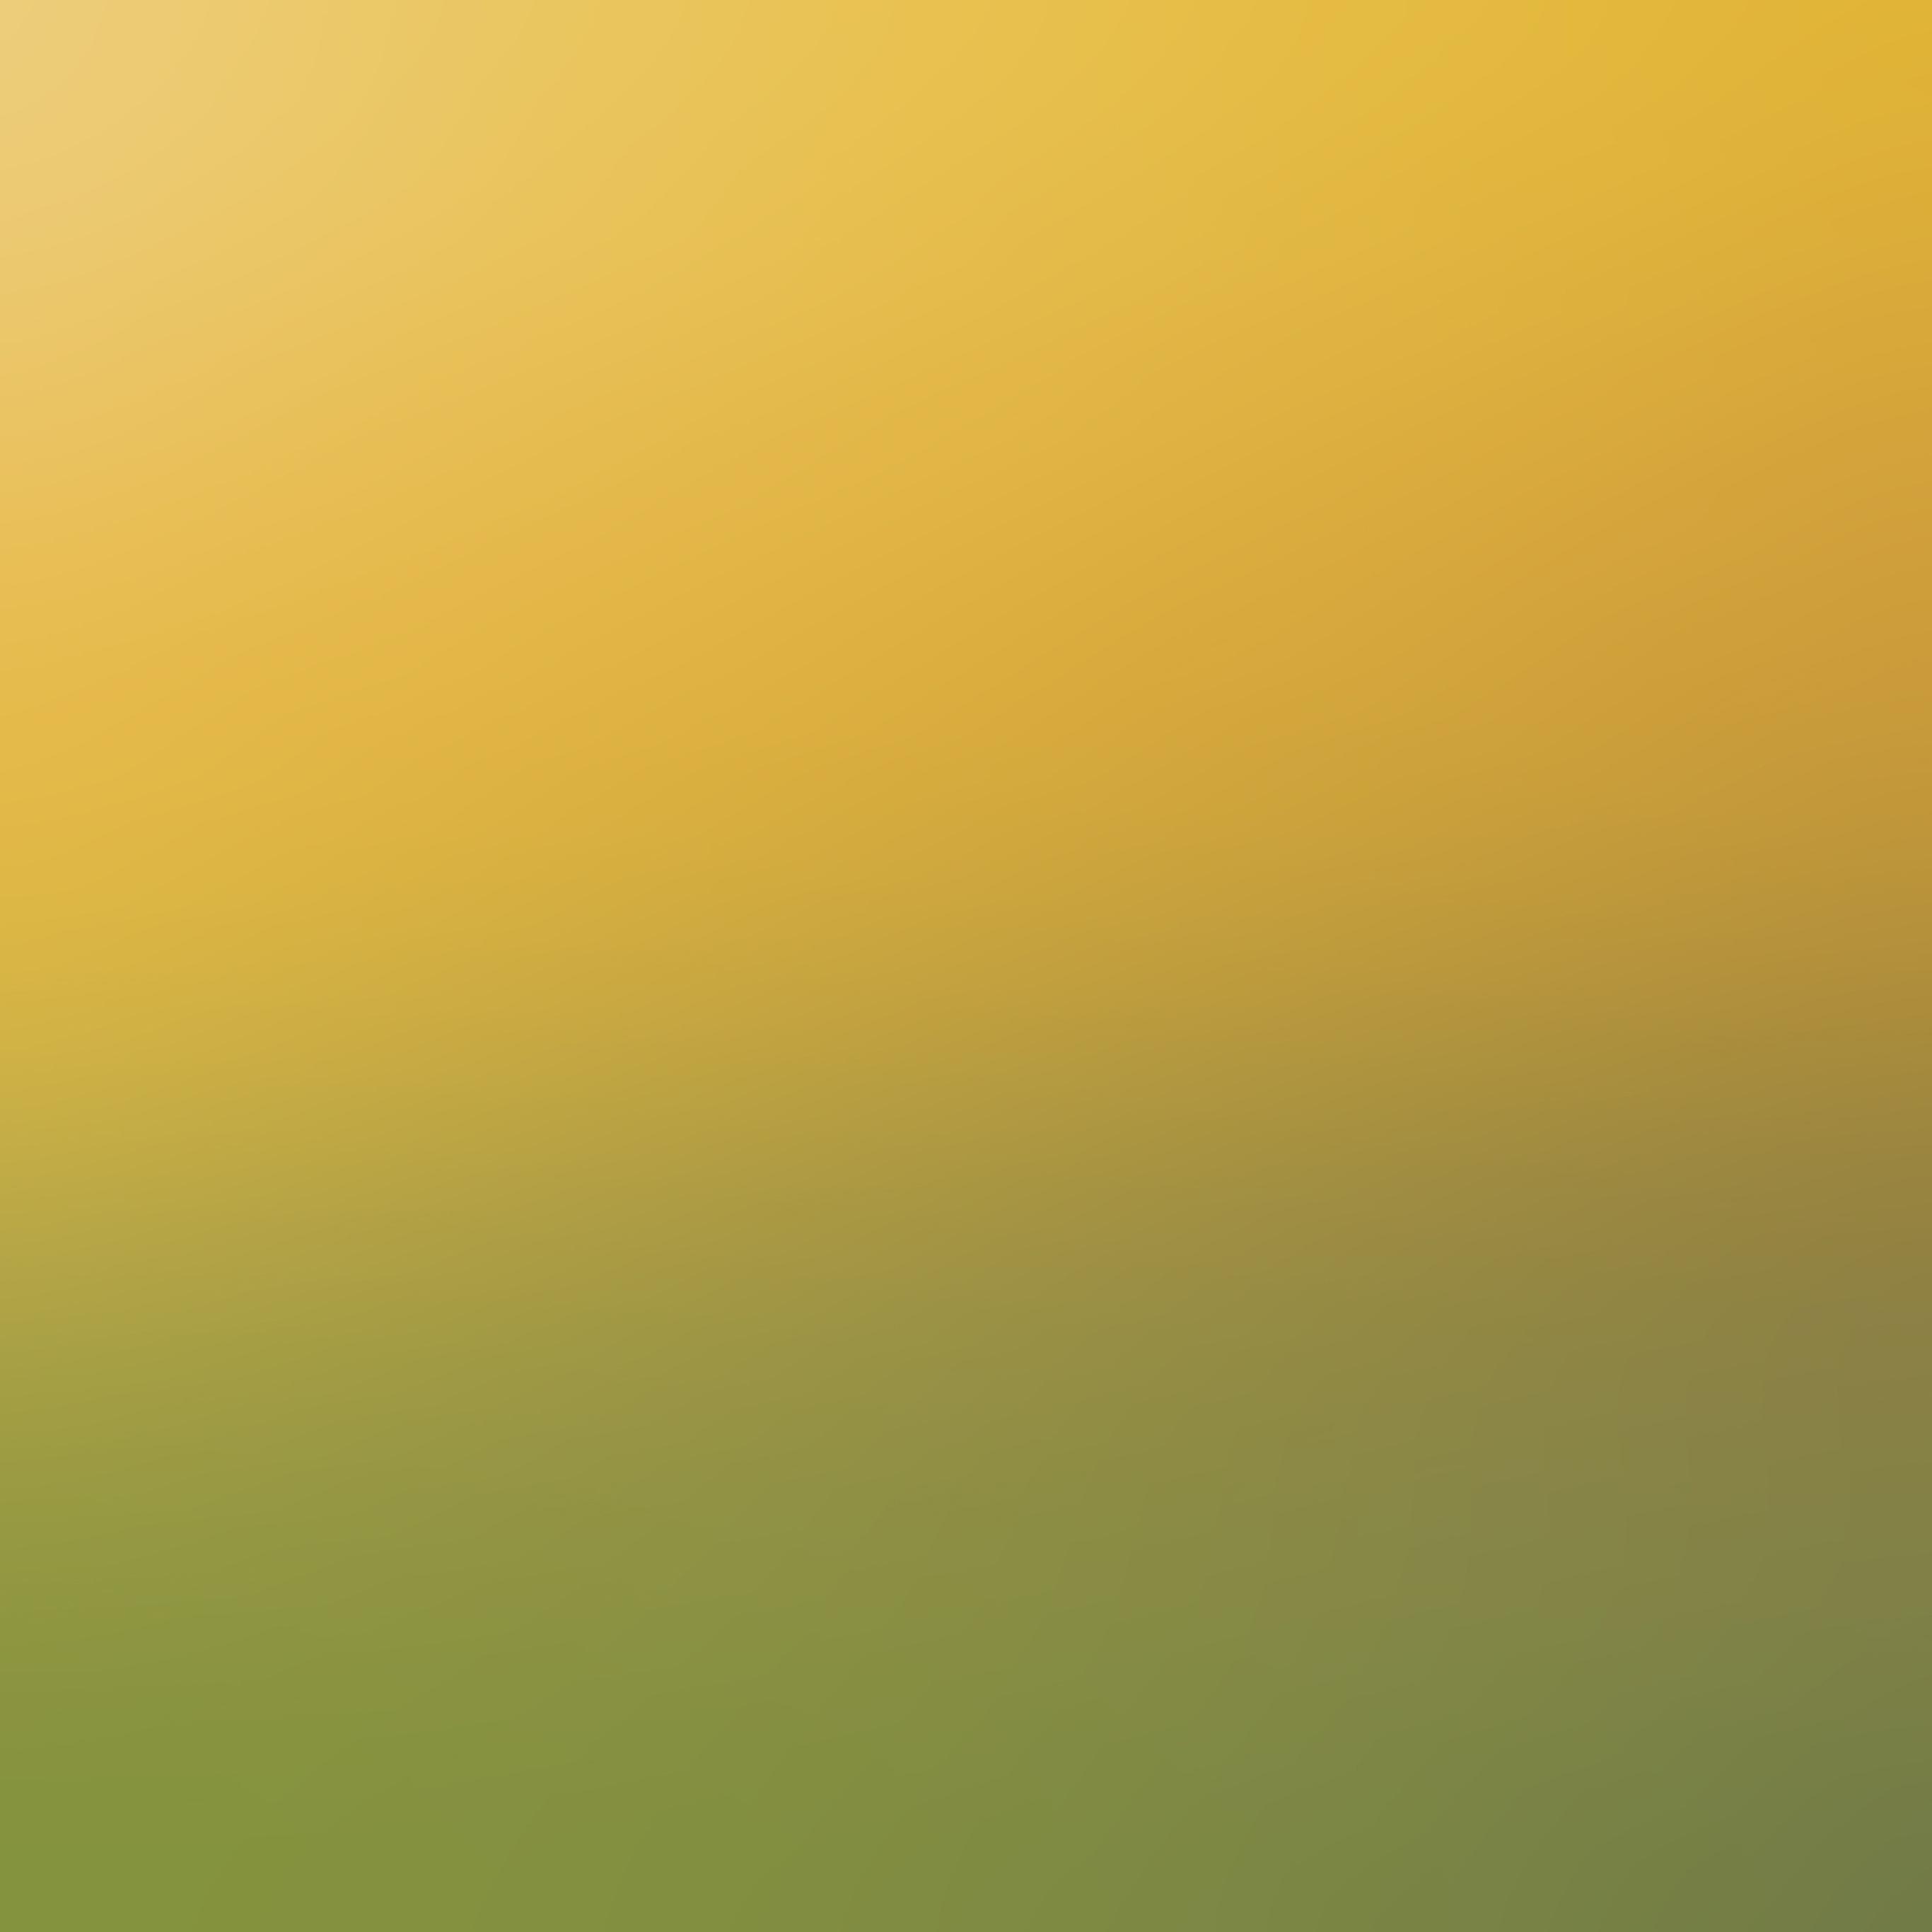 Backyard Baseball For Mac Download: Sc87-backyard-beauty-day-blur